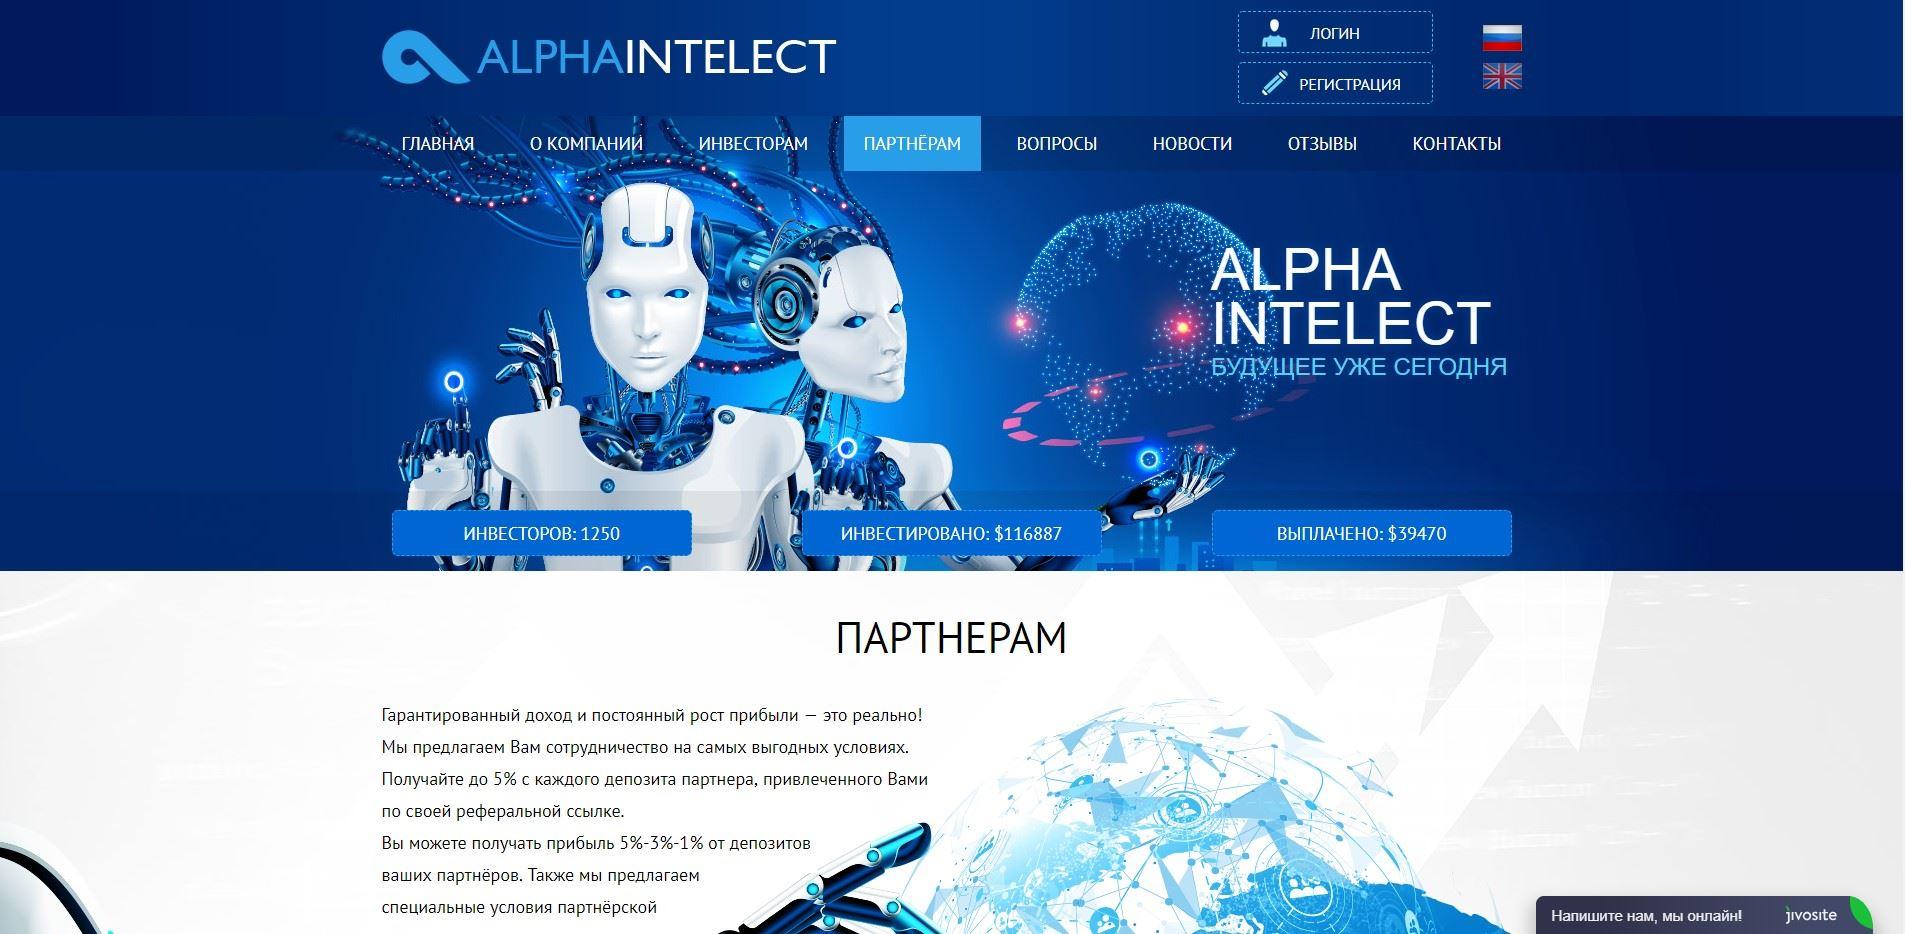 Alpha intelect